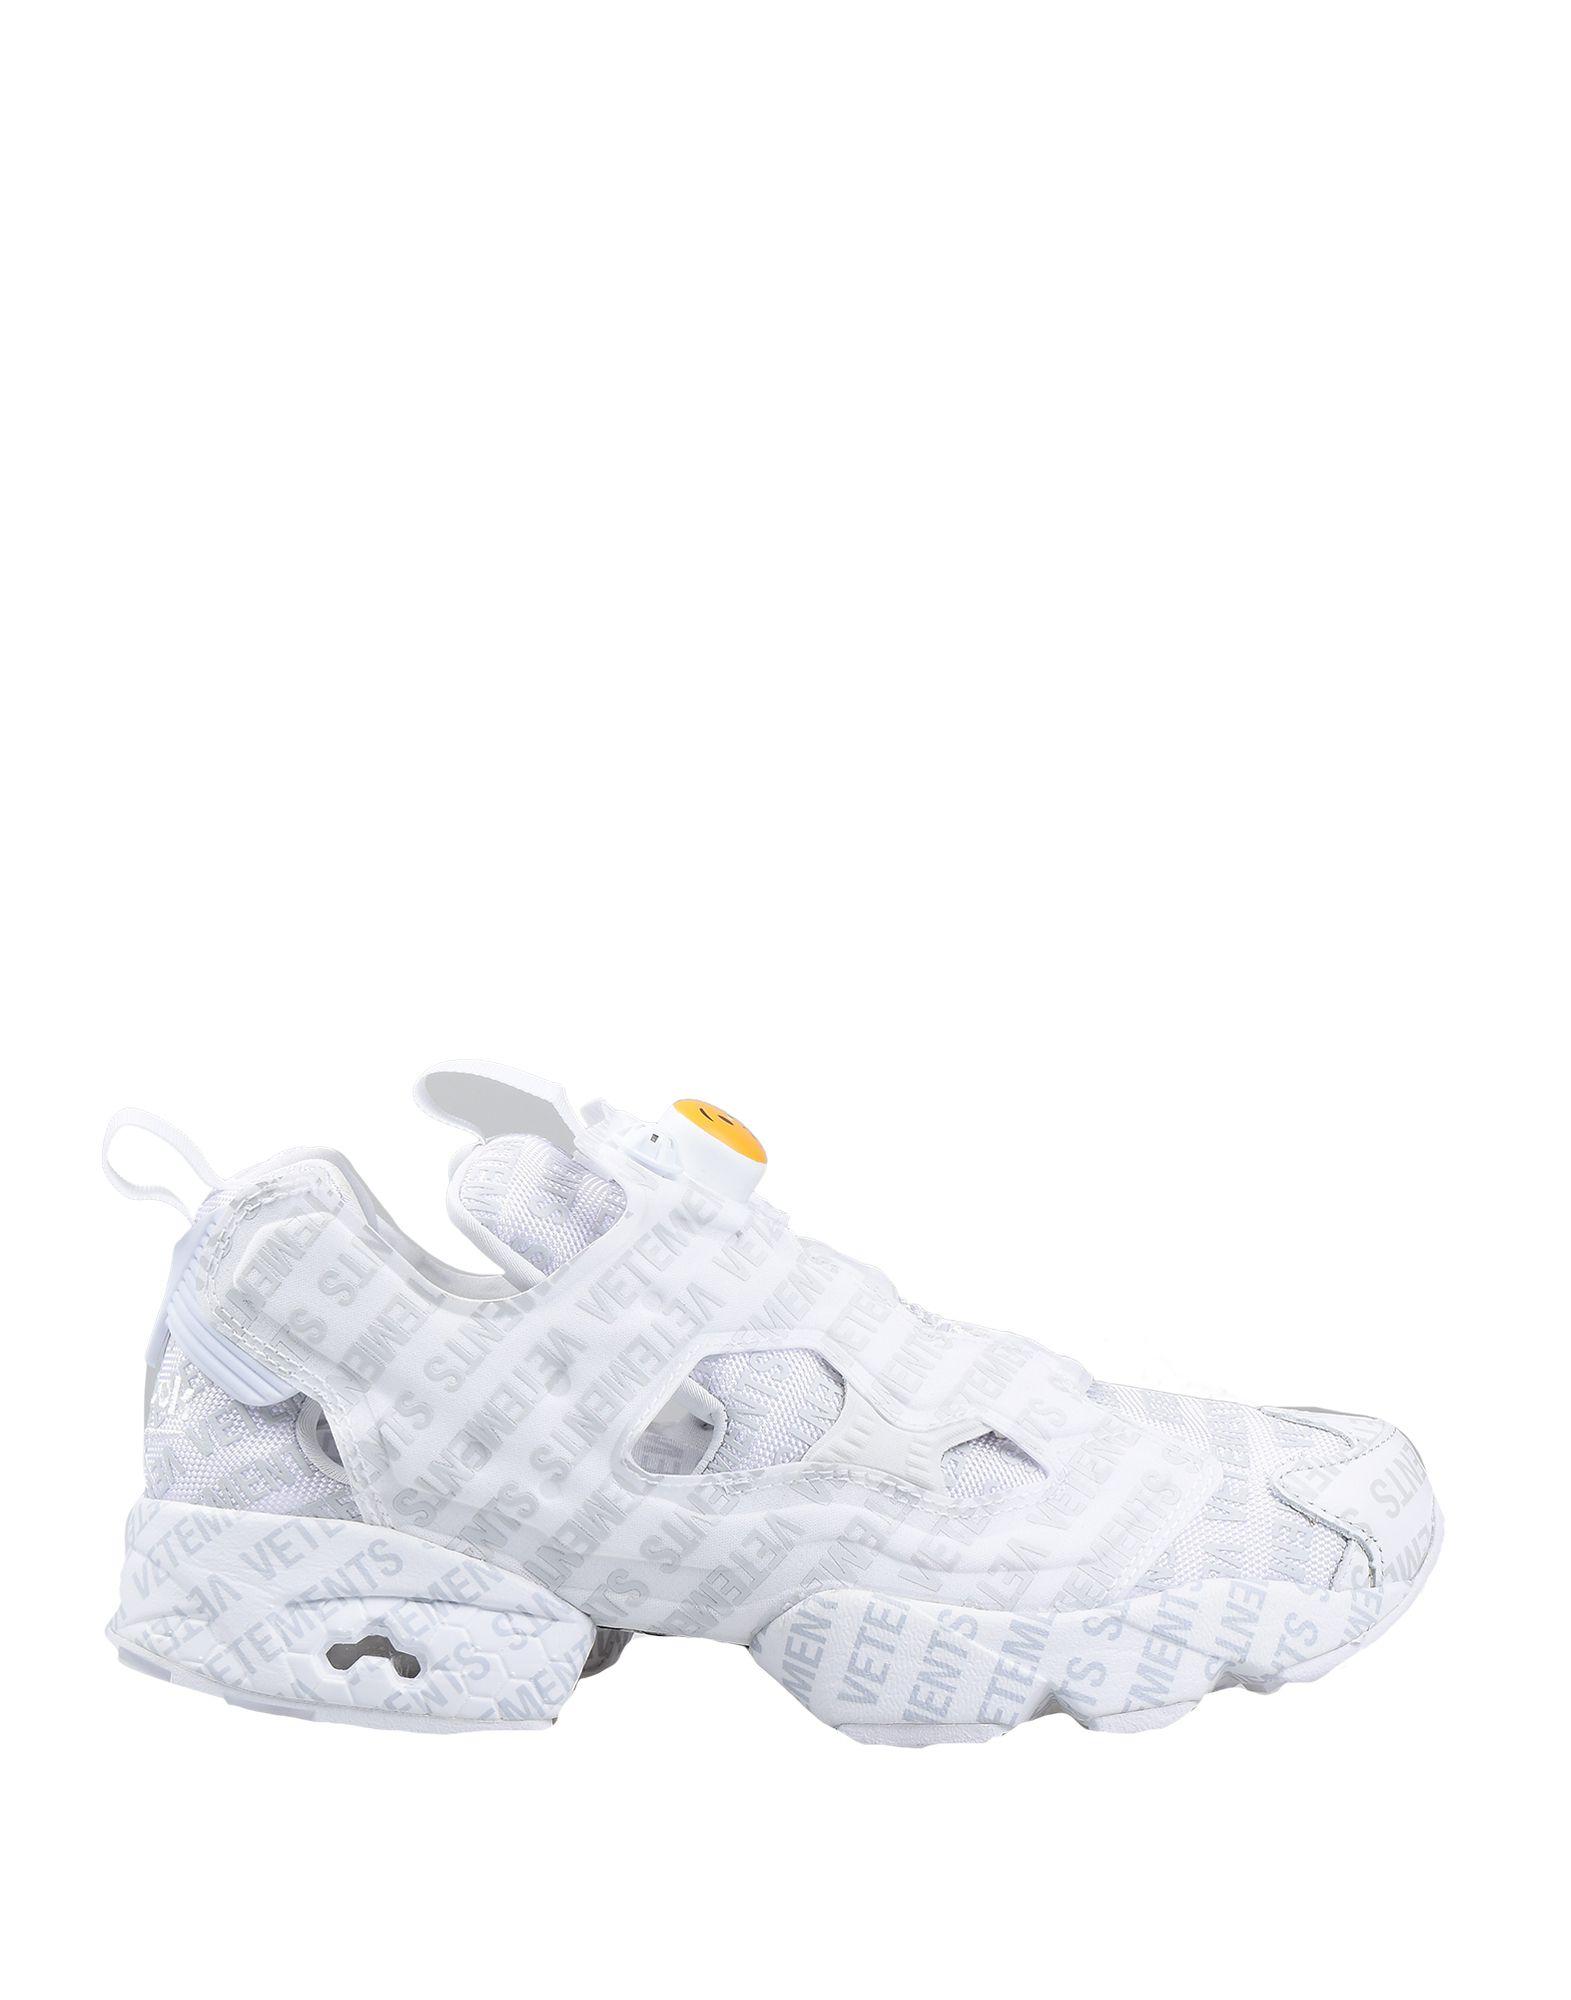 REEBOK x VETEMENTS Низкие кеды и кроссовки кроссовки reebok cl nylon color